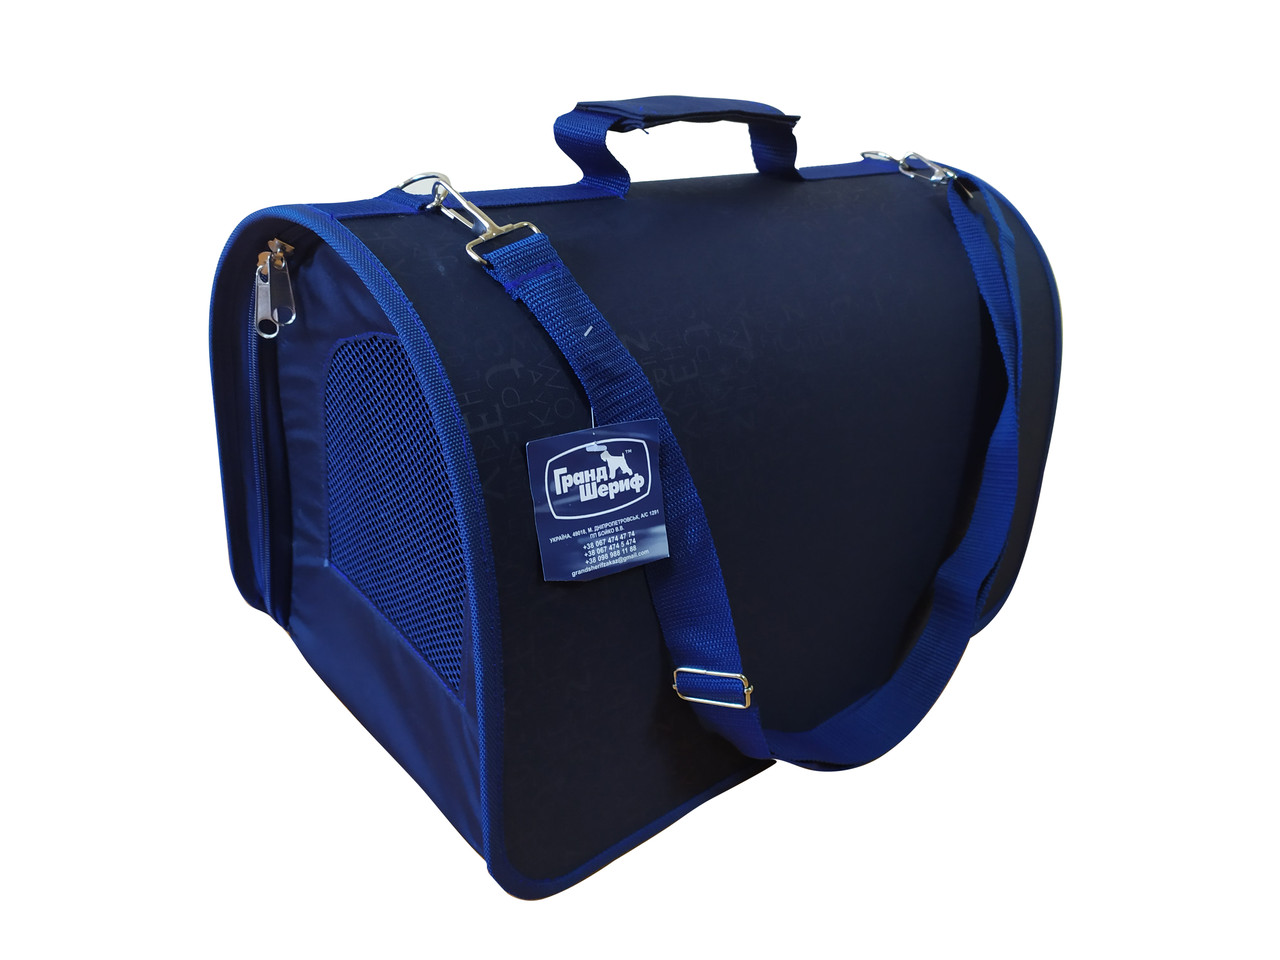 Сумка-переноска Гранд Шериф 40,5х26х30,5см (синяя)